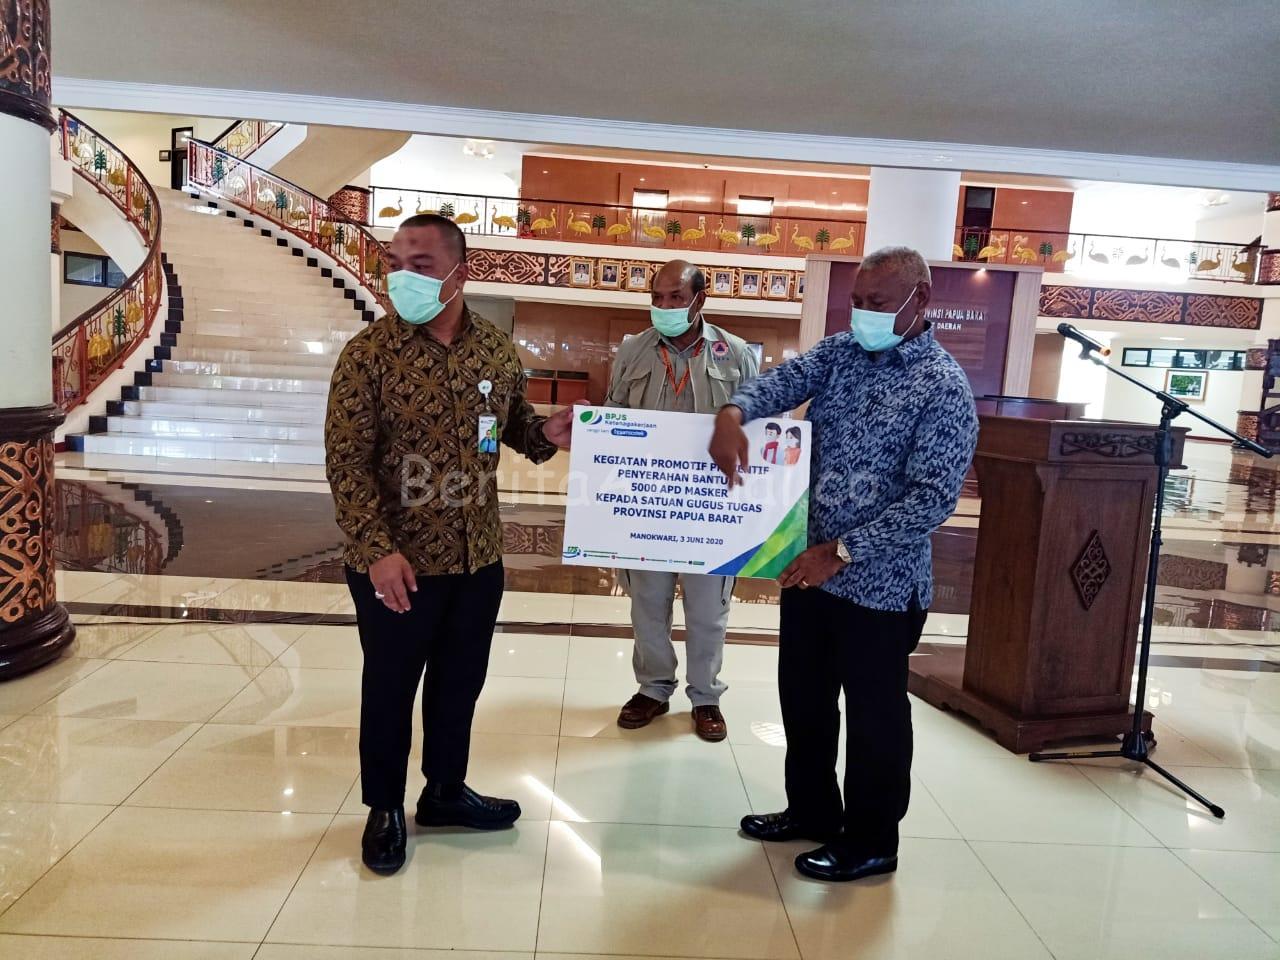 Gubernur Papua Barat Terima Bantuan 5000 Masker Dari BPJS Ketenagakerjaan 1 IMG 20200604 WA0056